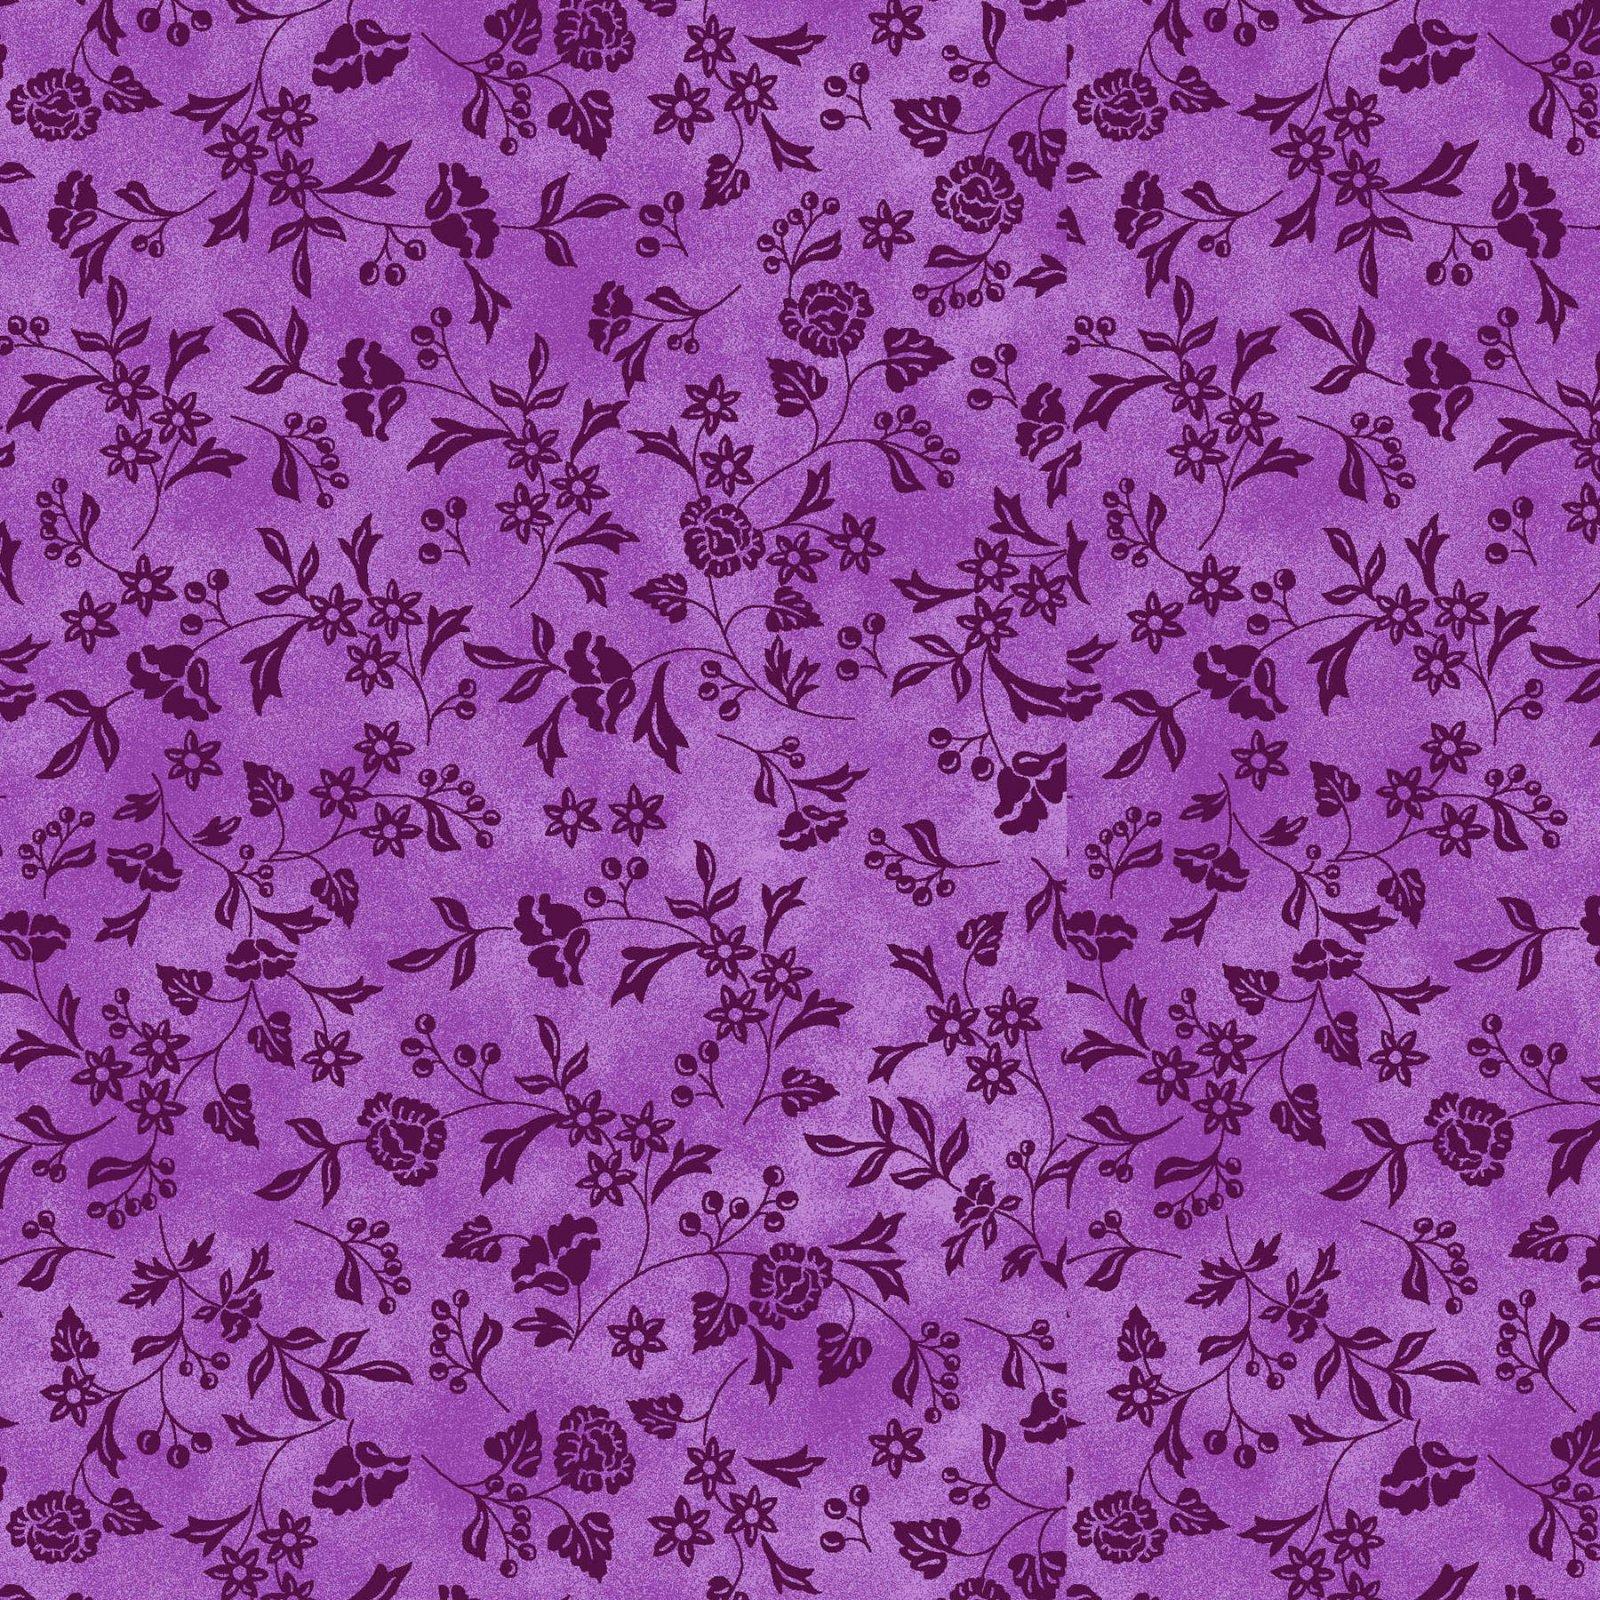 P3-467 Baltimore Spring Purple Tonal Vine